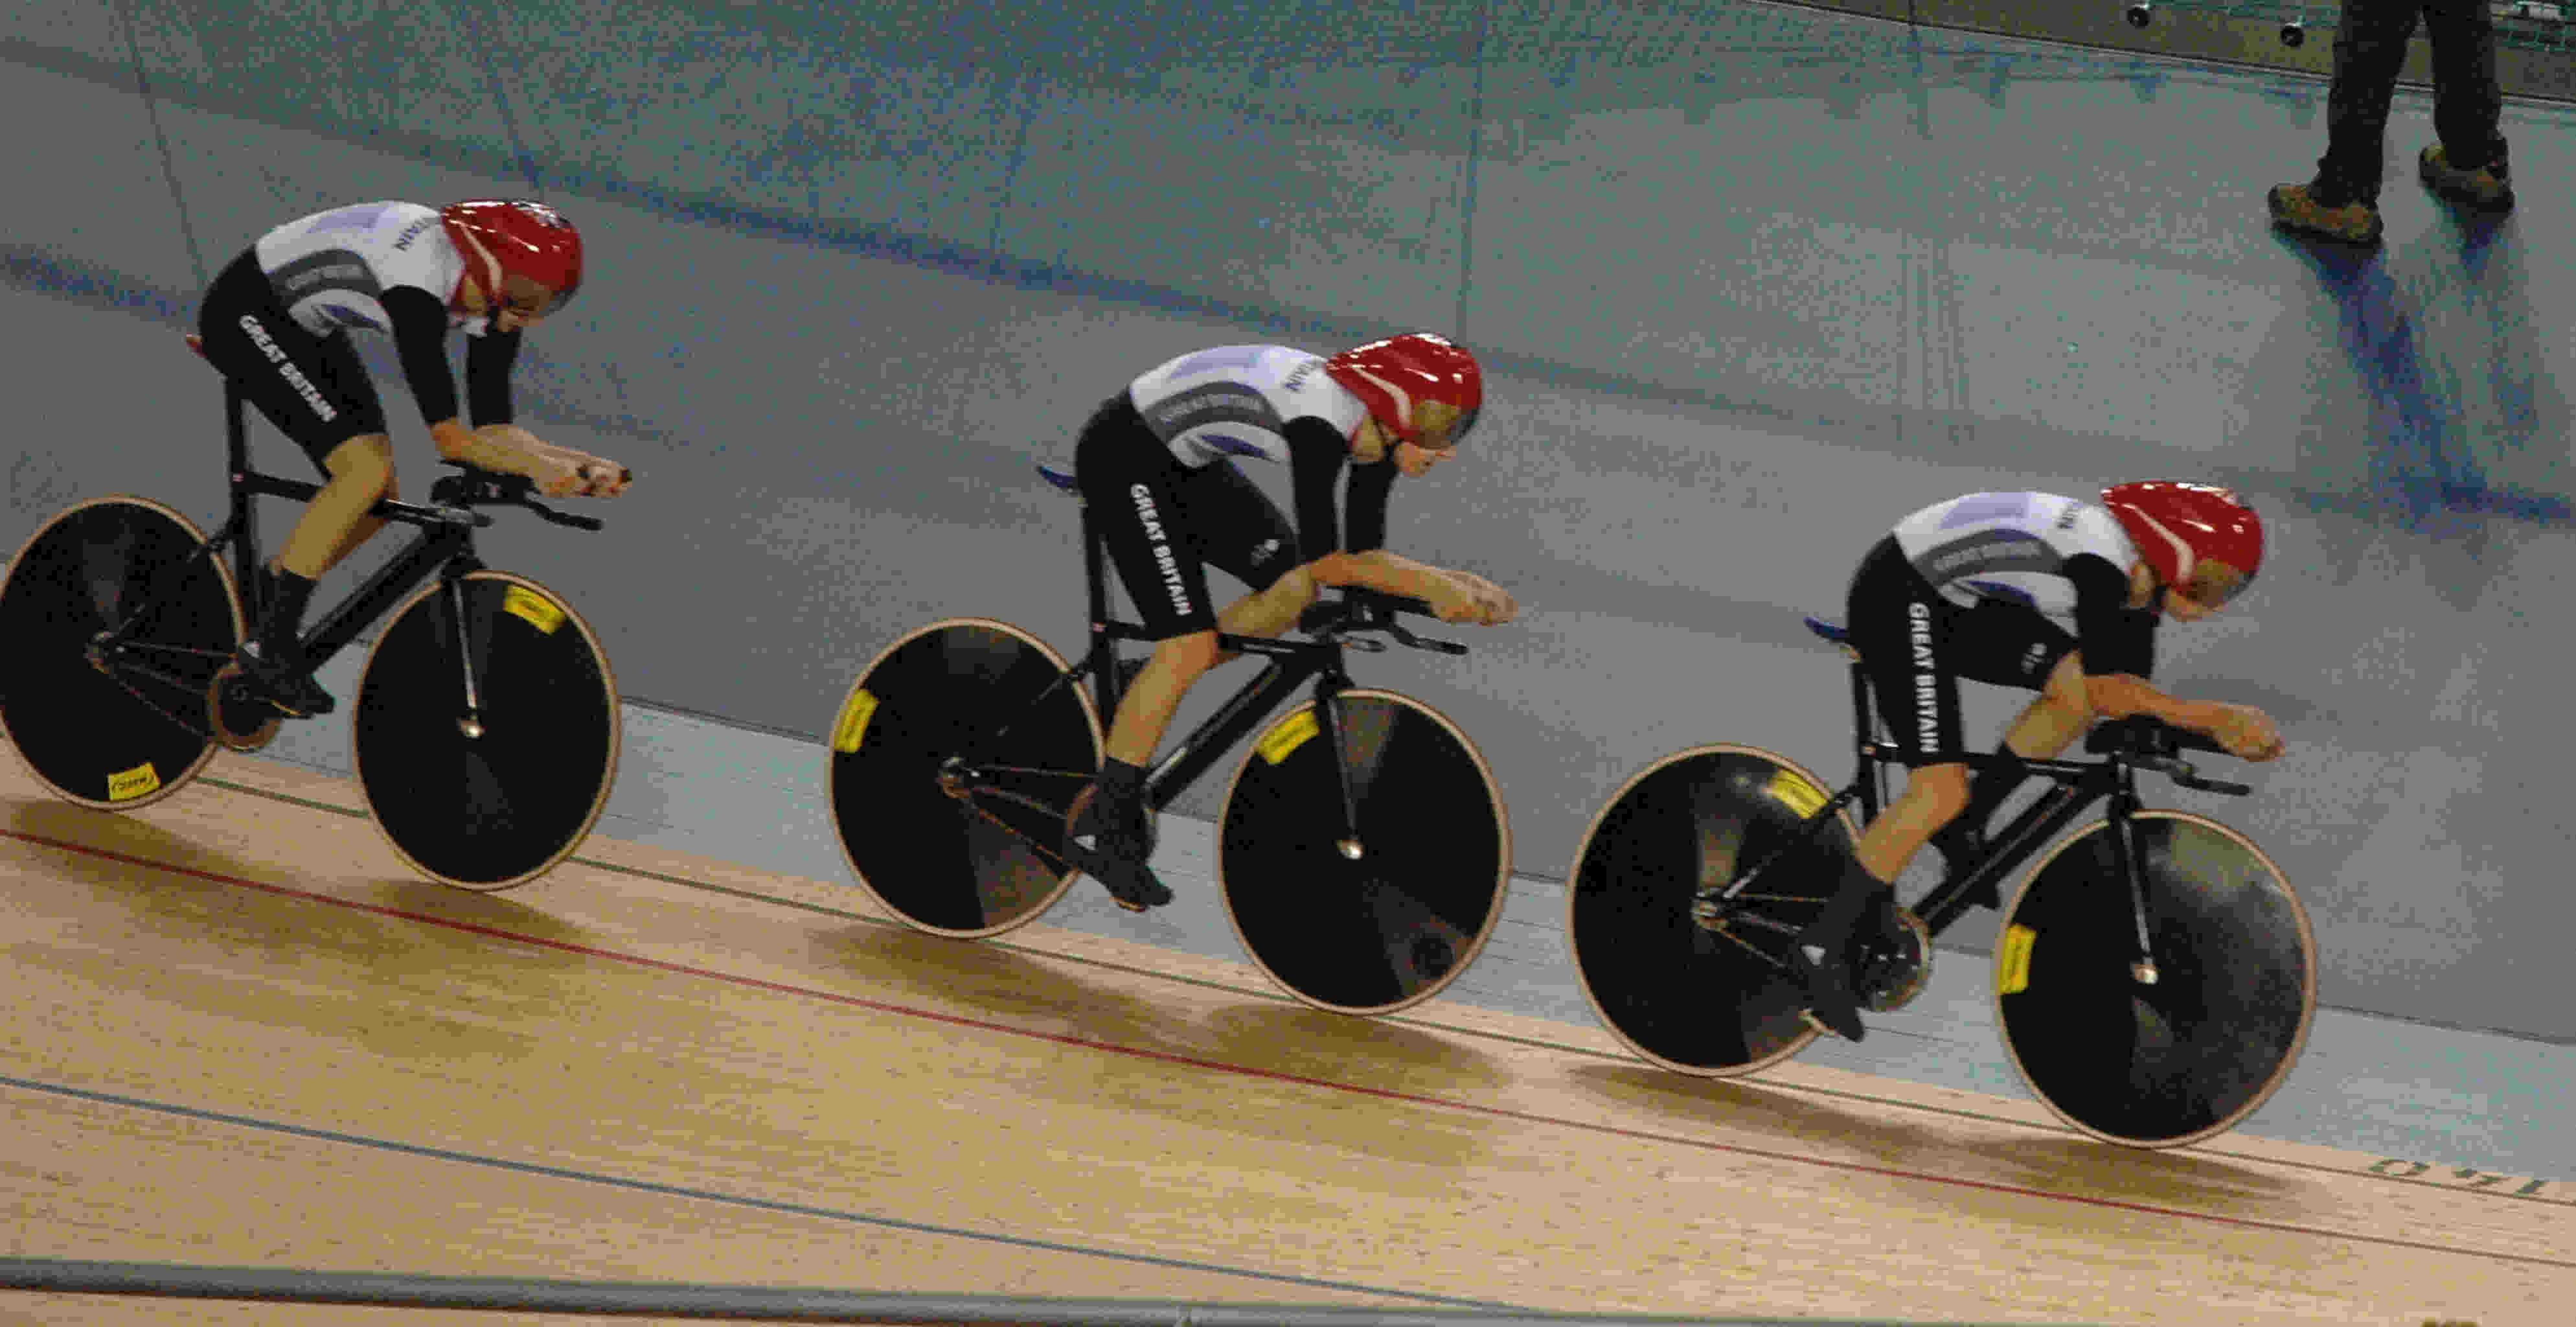 British Cycling team - London 2012